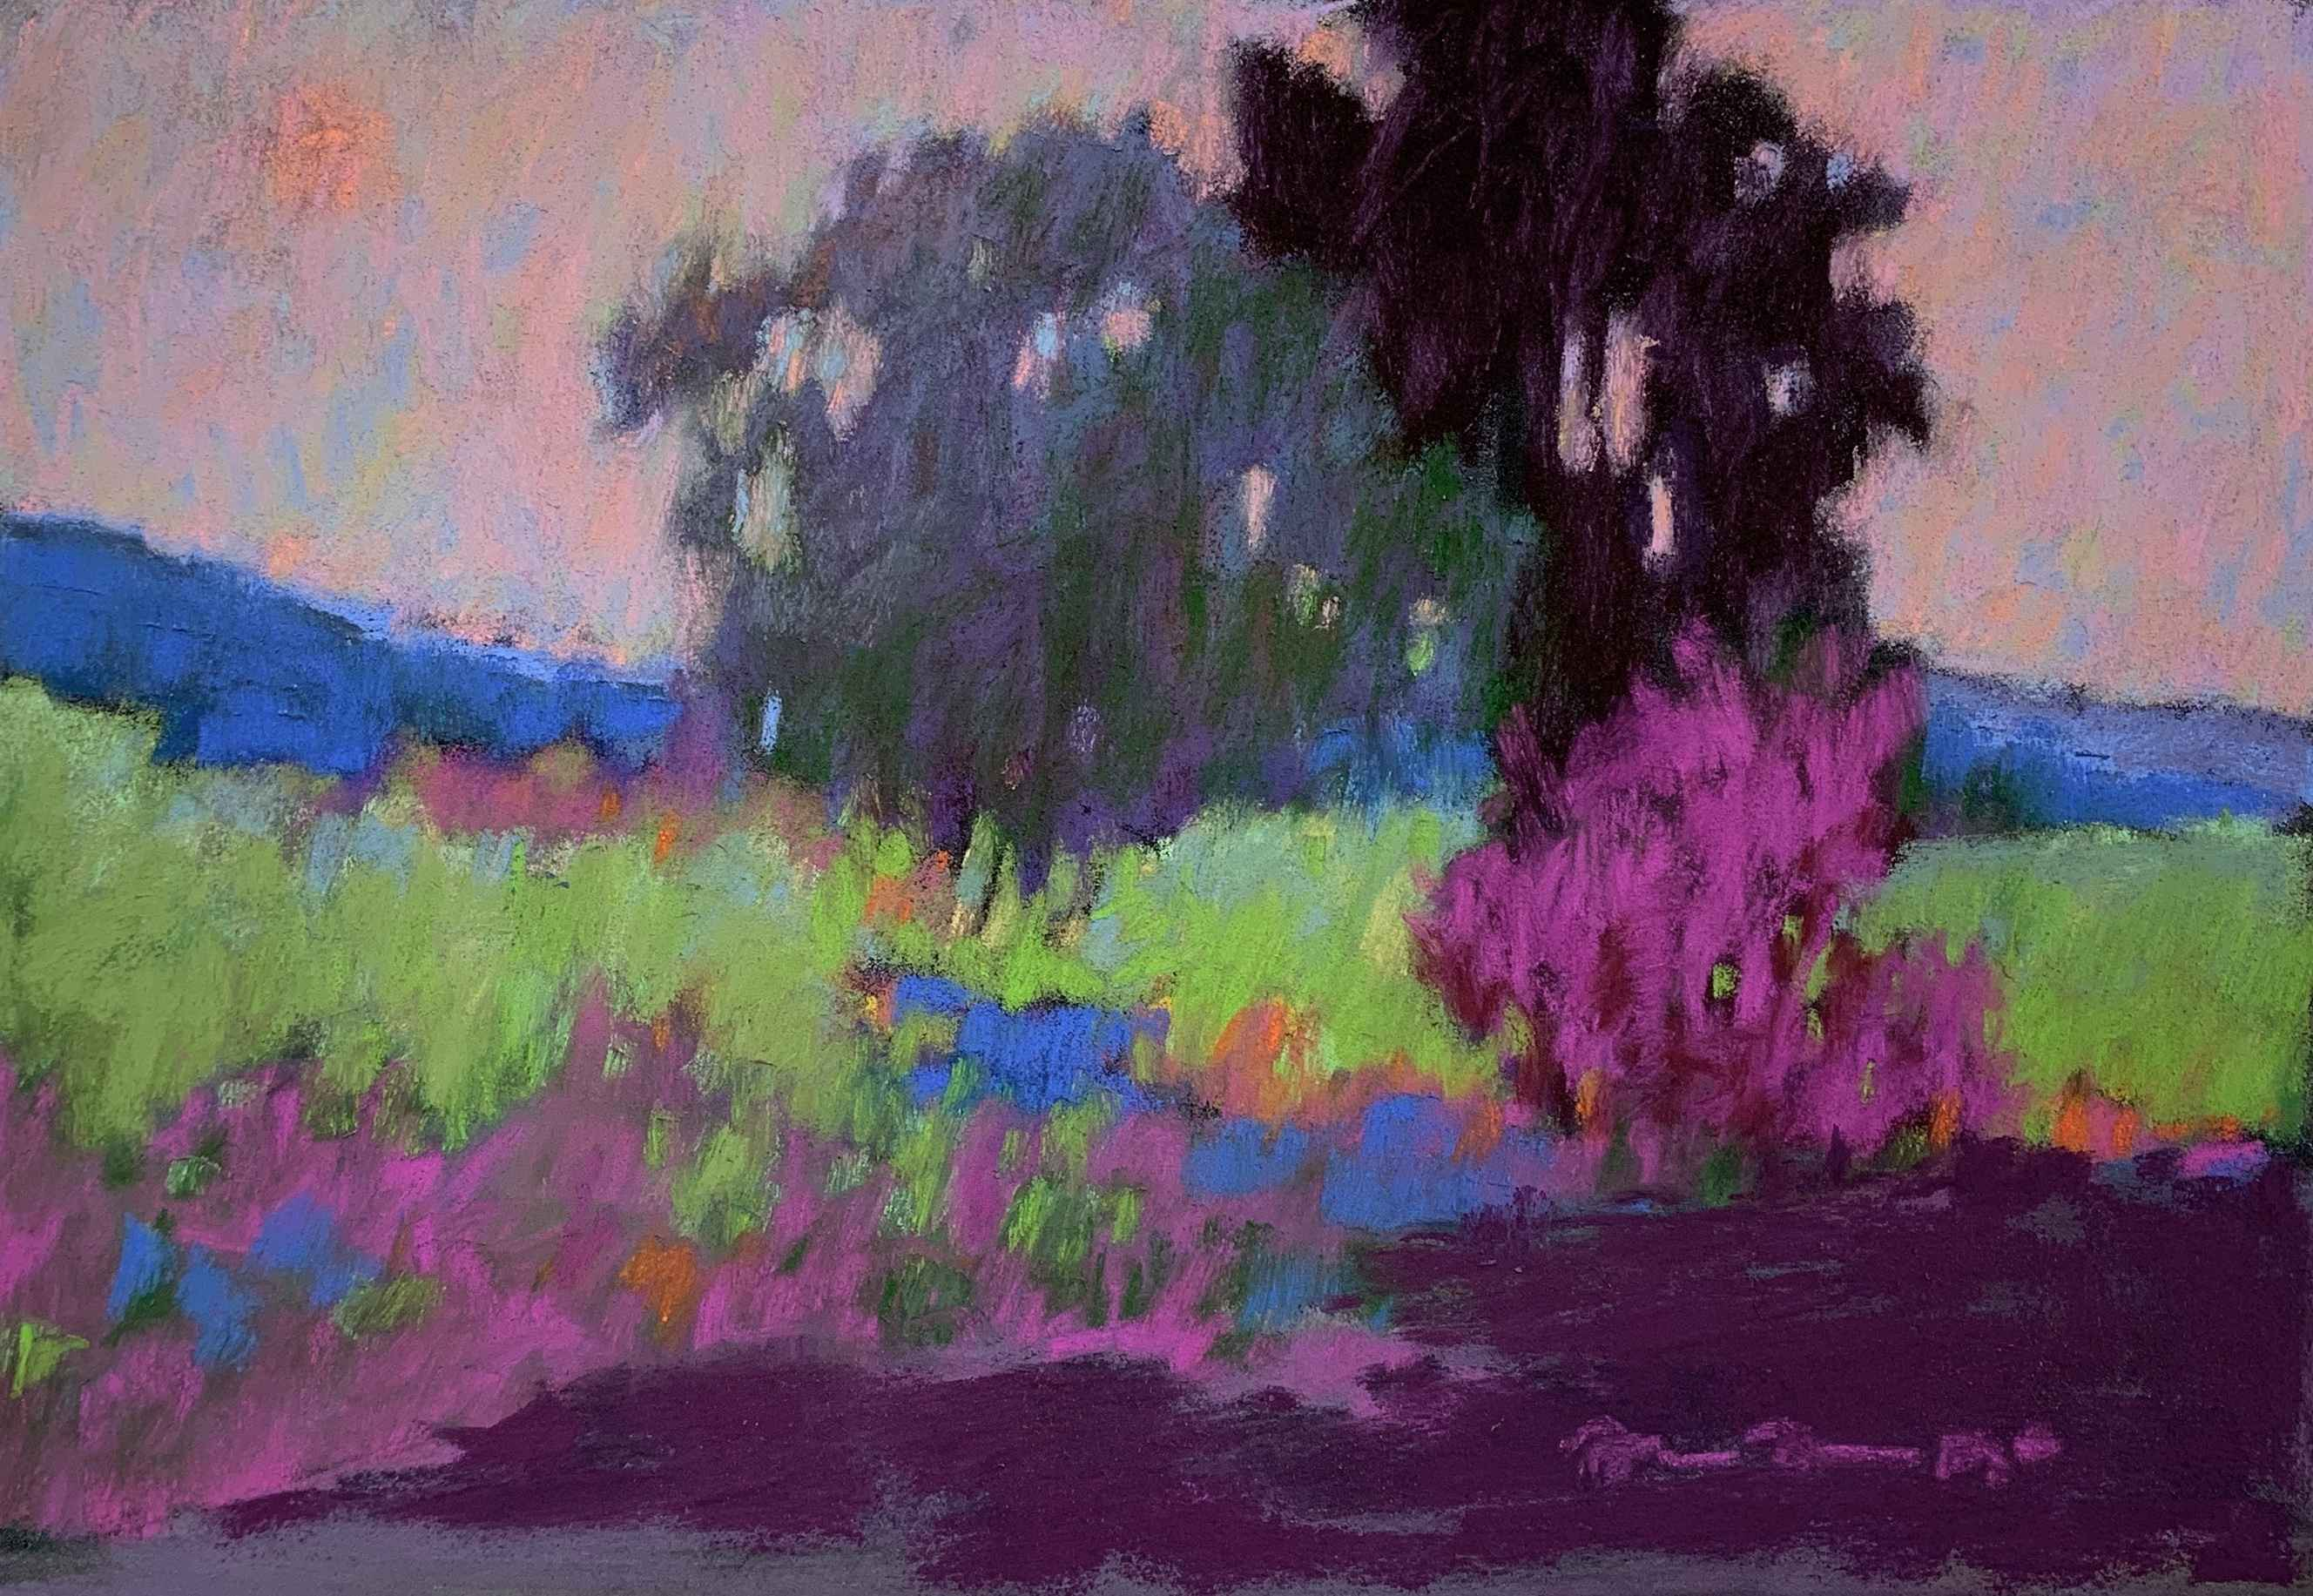 Vineyard View by  Julie Friedman - Masterpiece Online